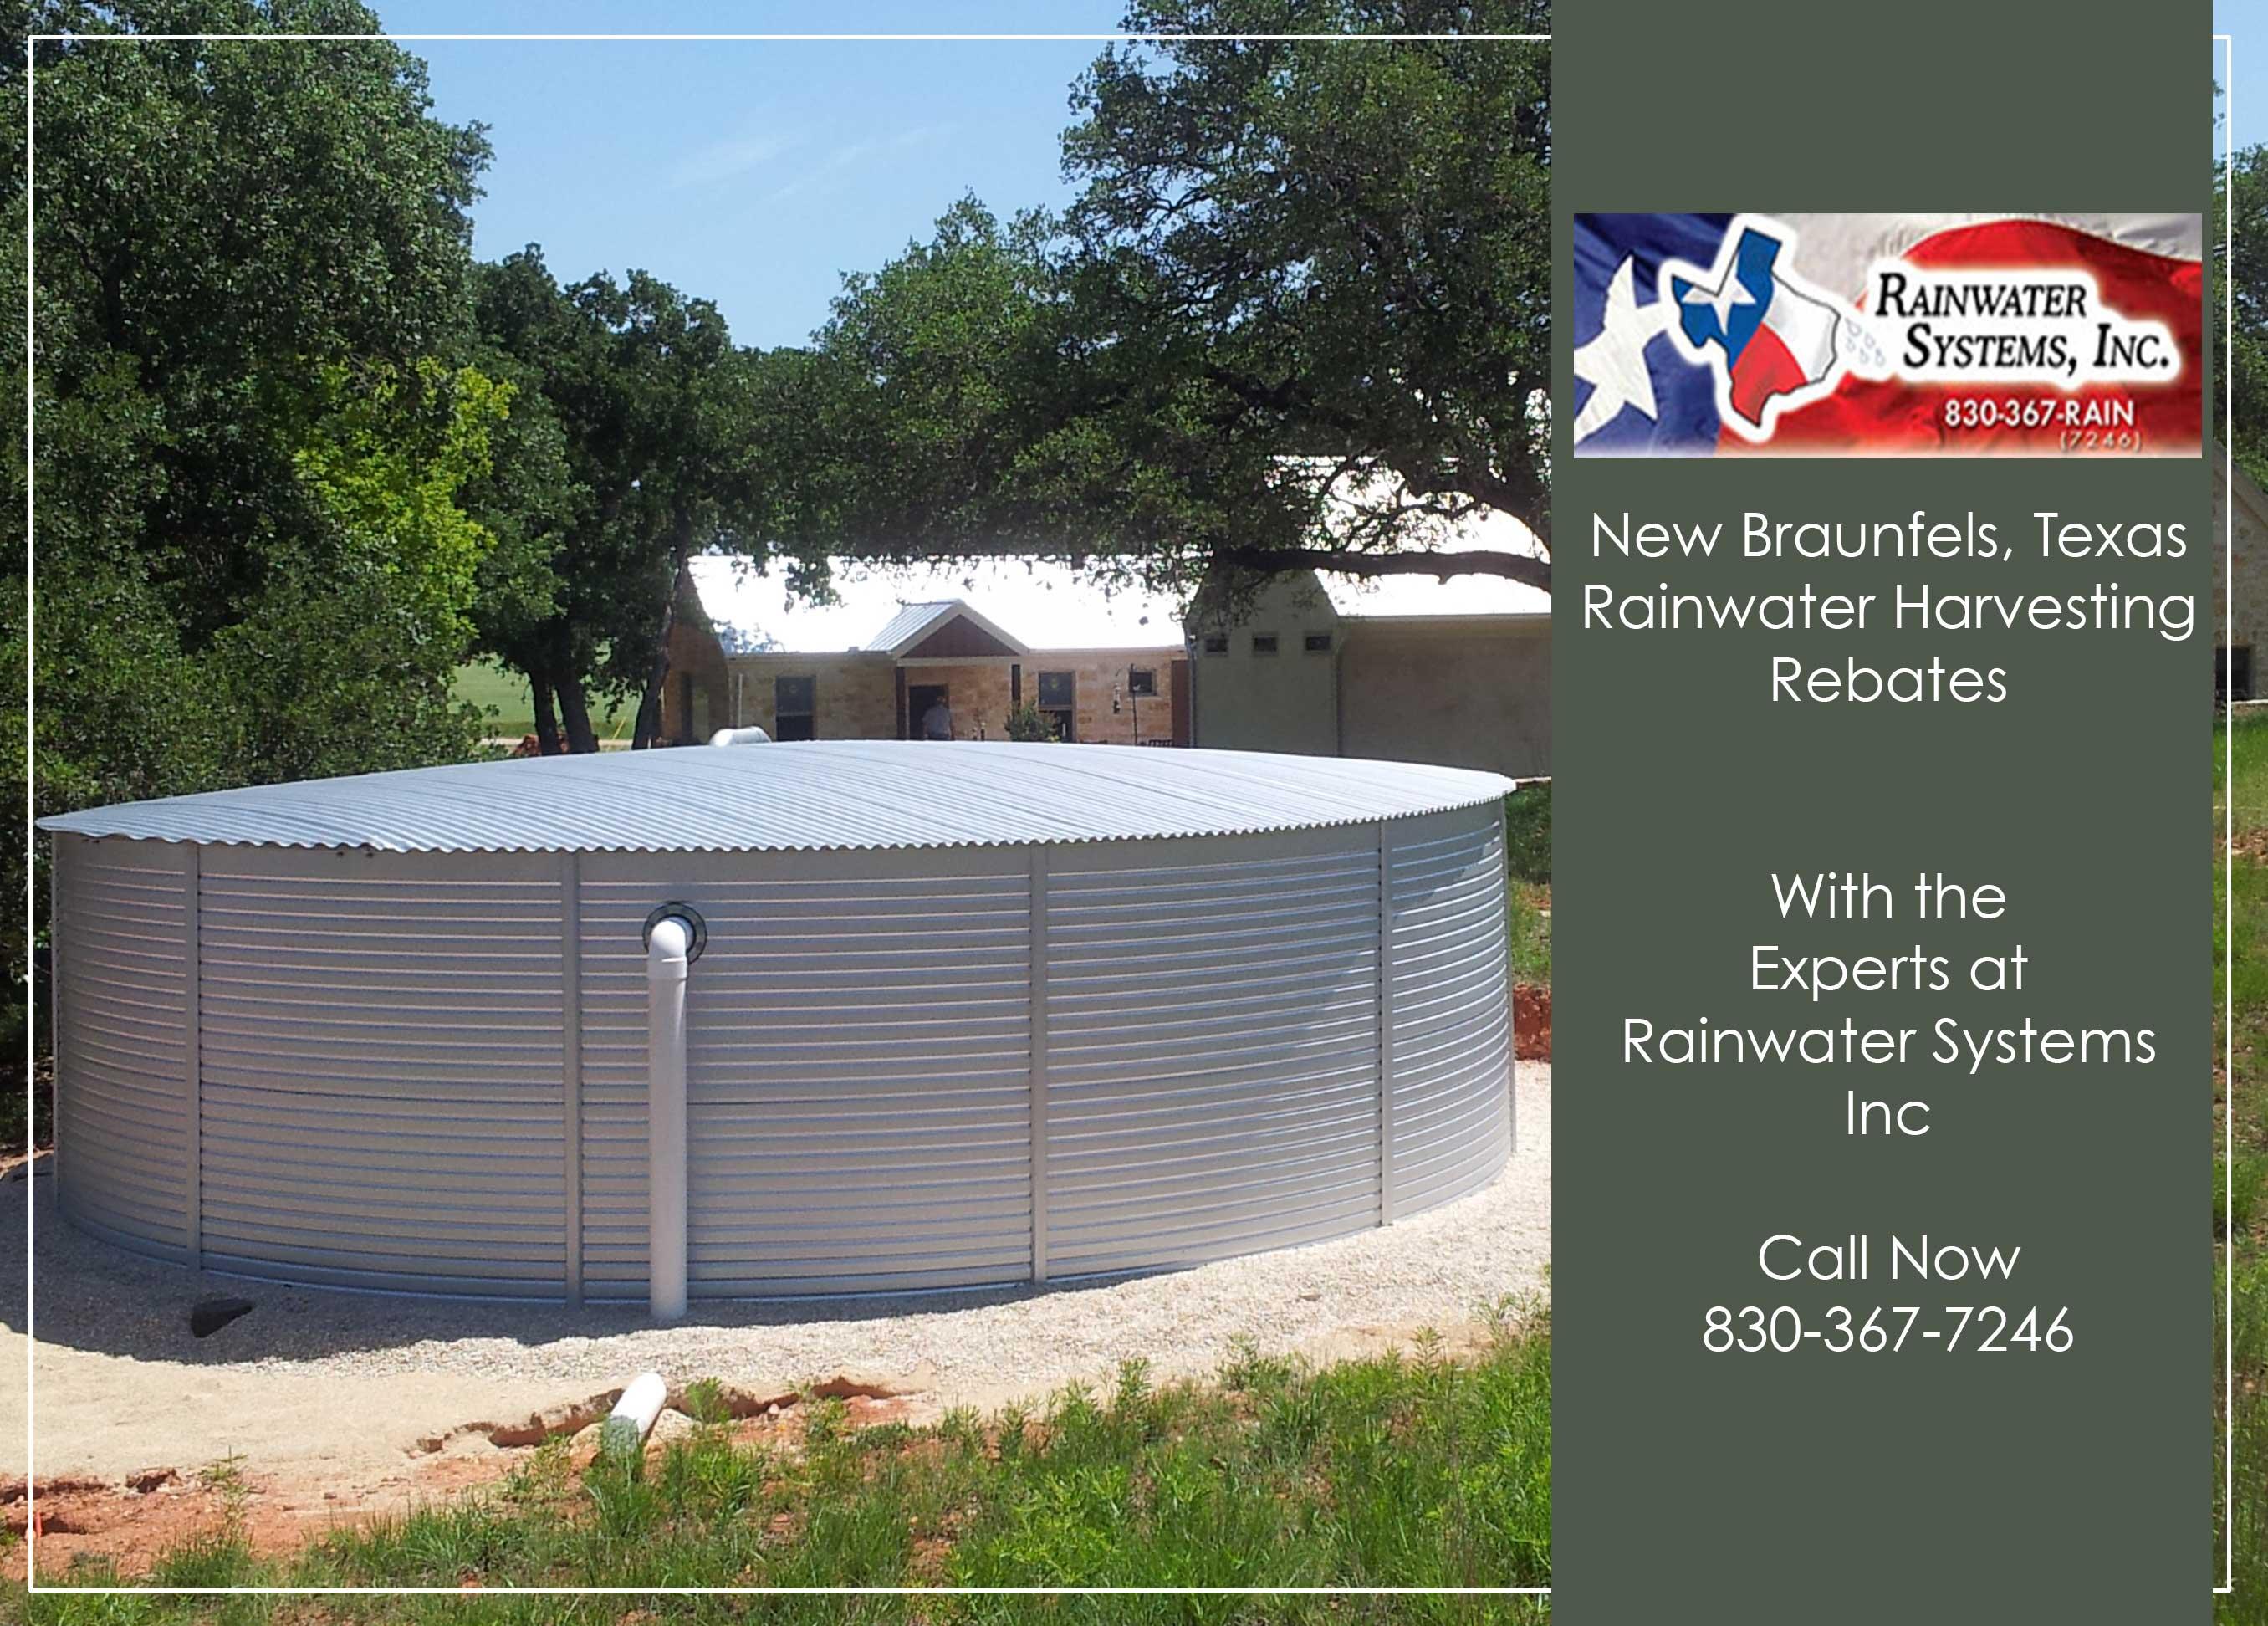 New Braunfels Texas Rainwater rebates with Rainwater Systems Inc